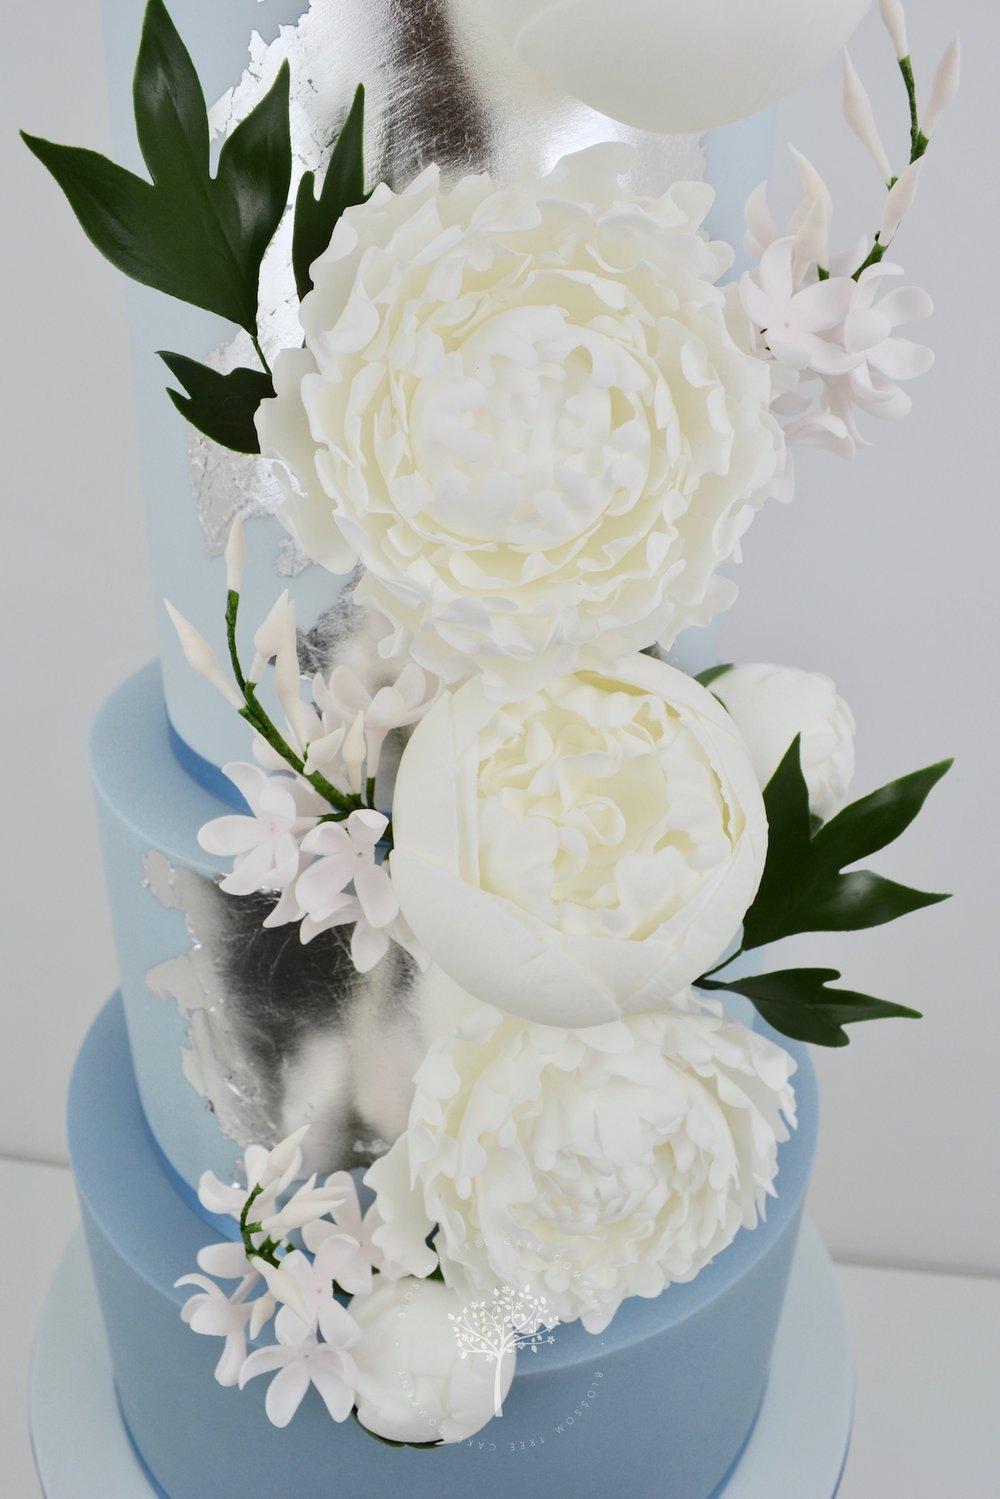 Dusky Blue and Peony wedding cake by Blossom Tree Cake Company Harrogate North Yorkshire - sugar peonies.jpg